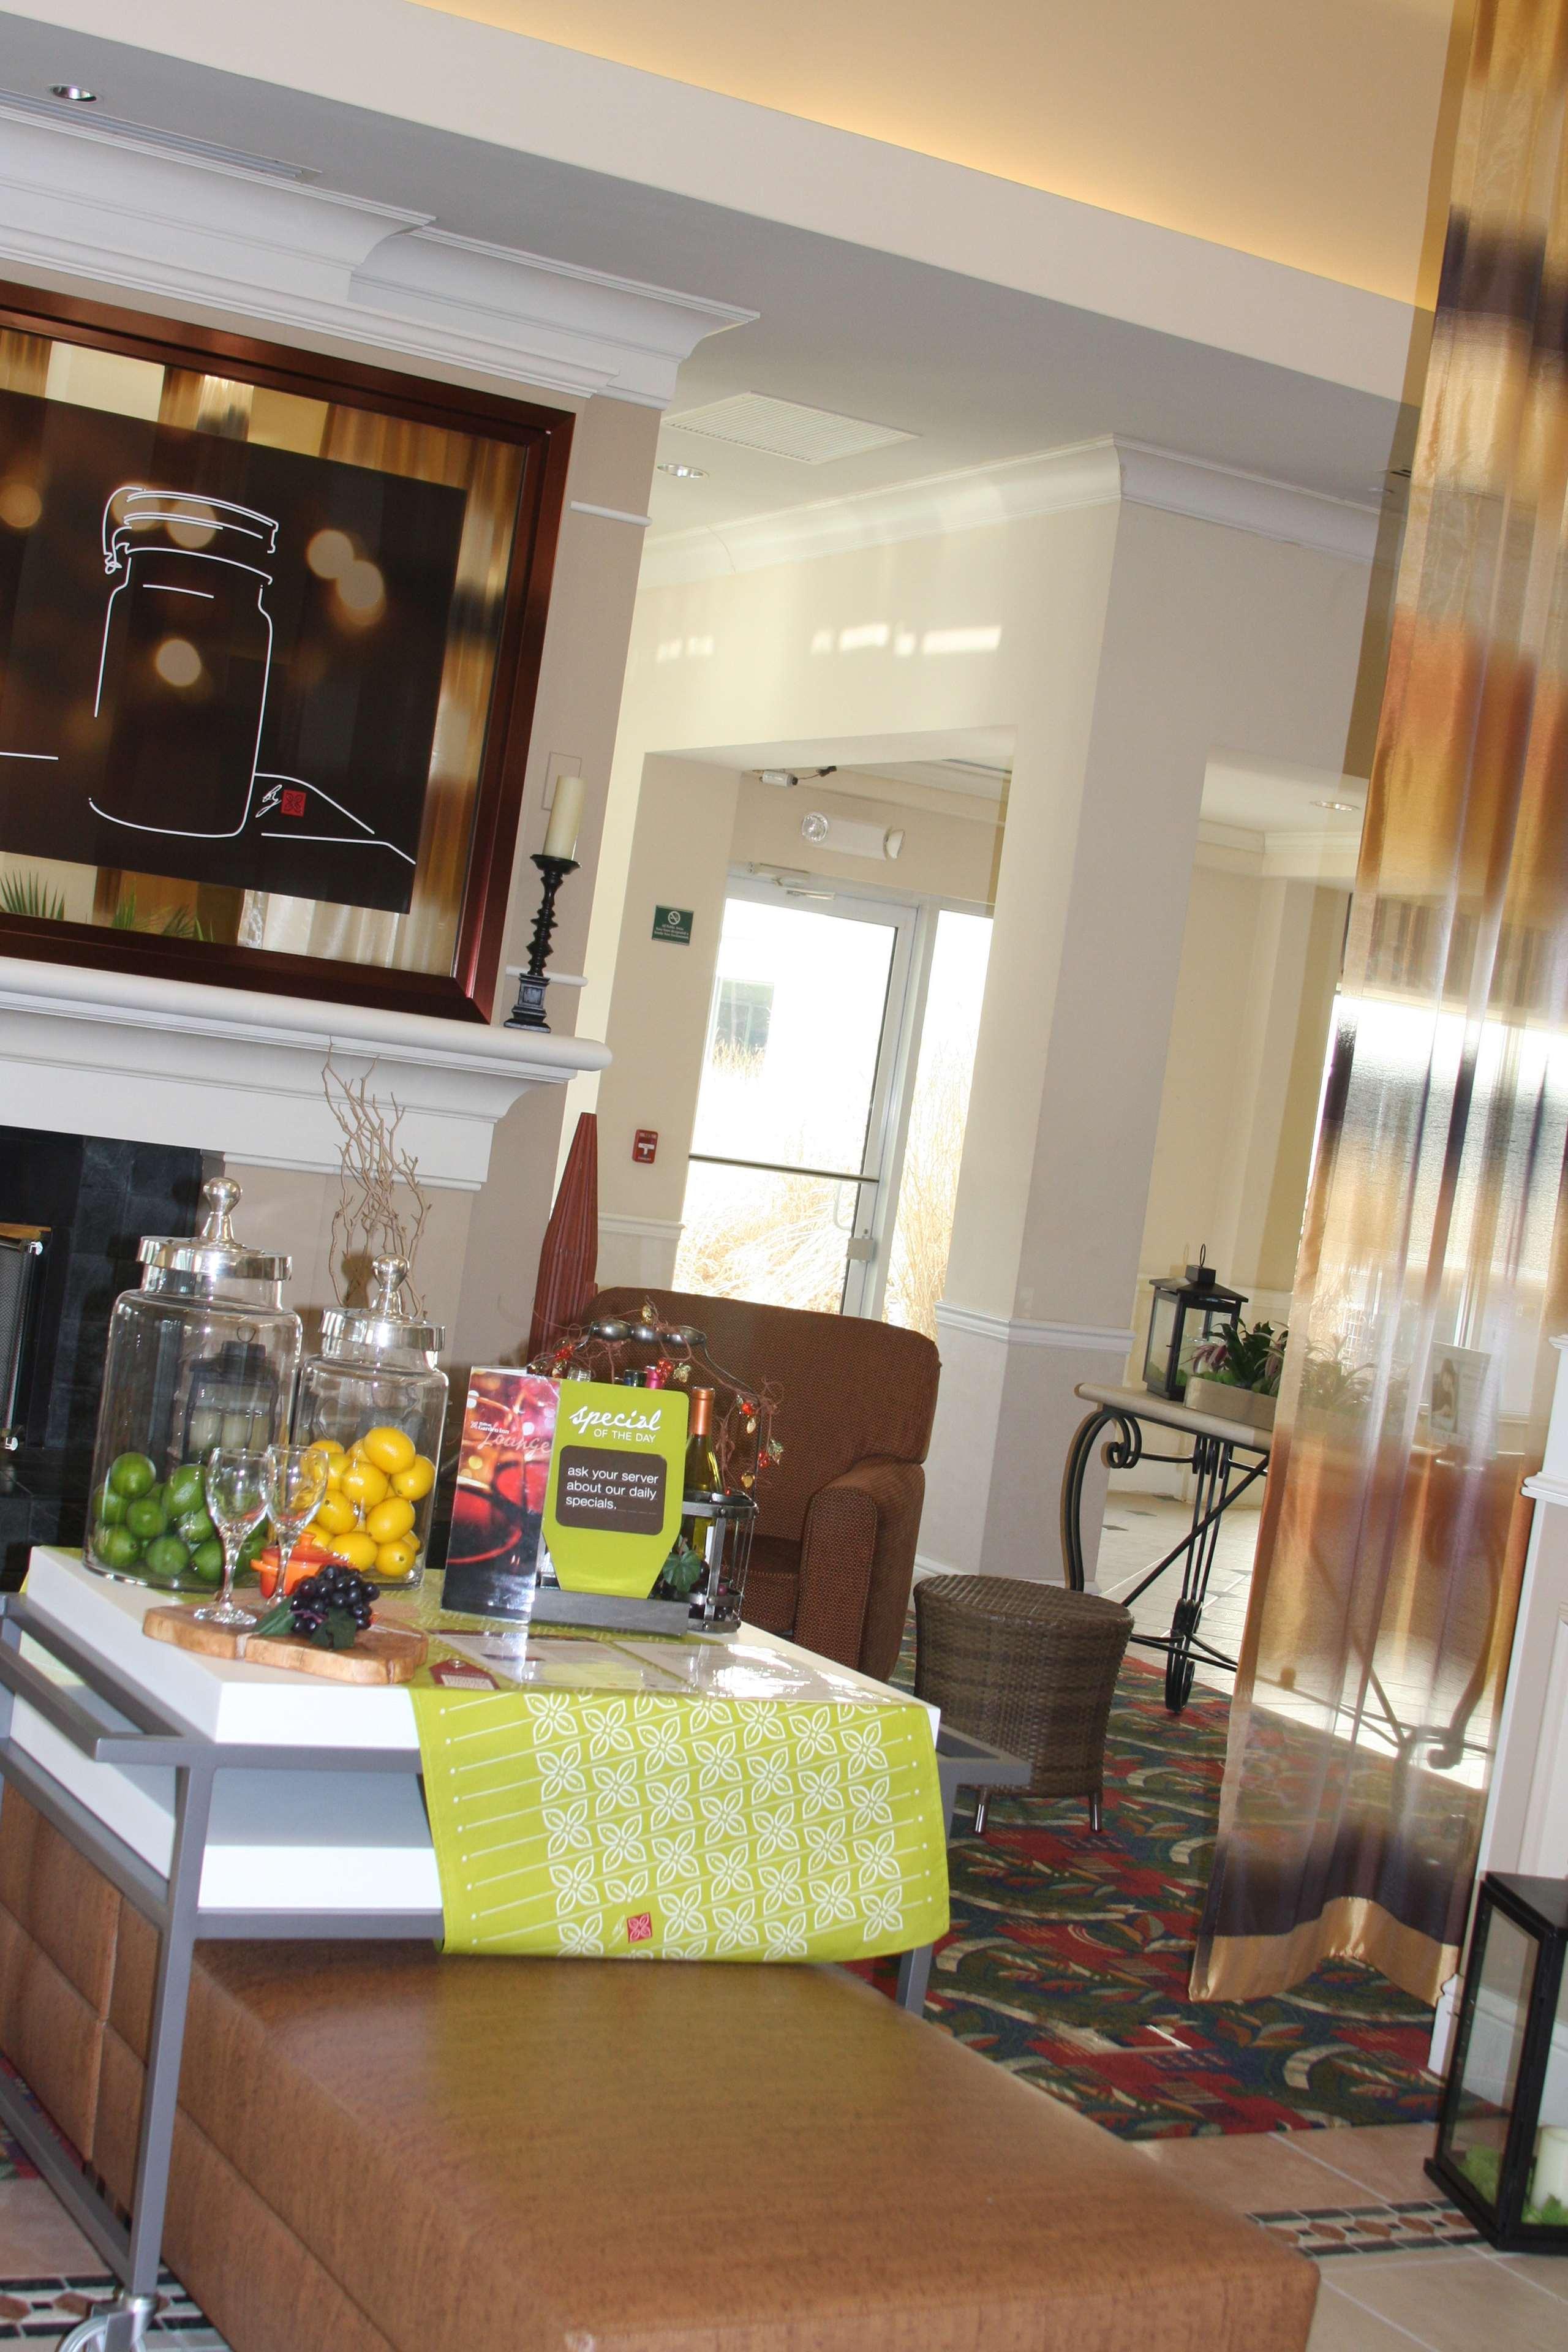 Hilton Garden Inn Elmira/Corning image 6